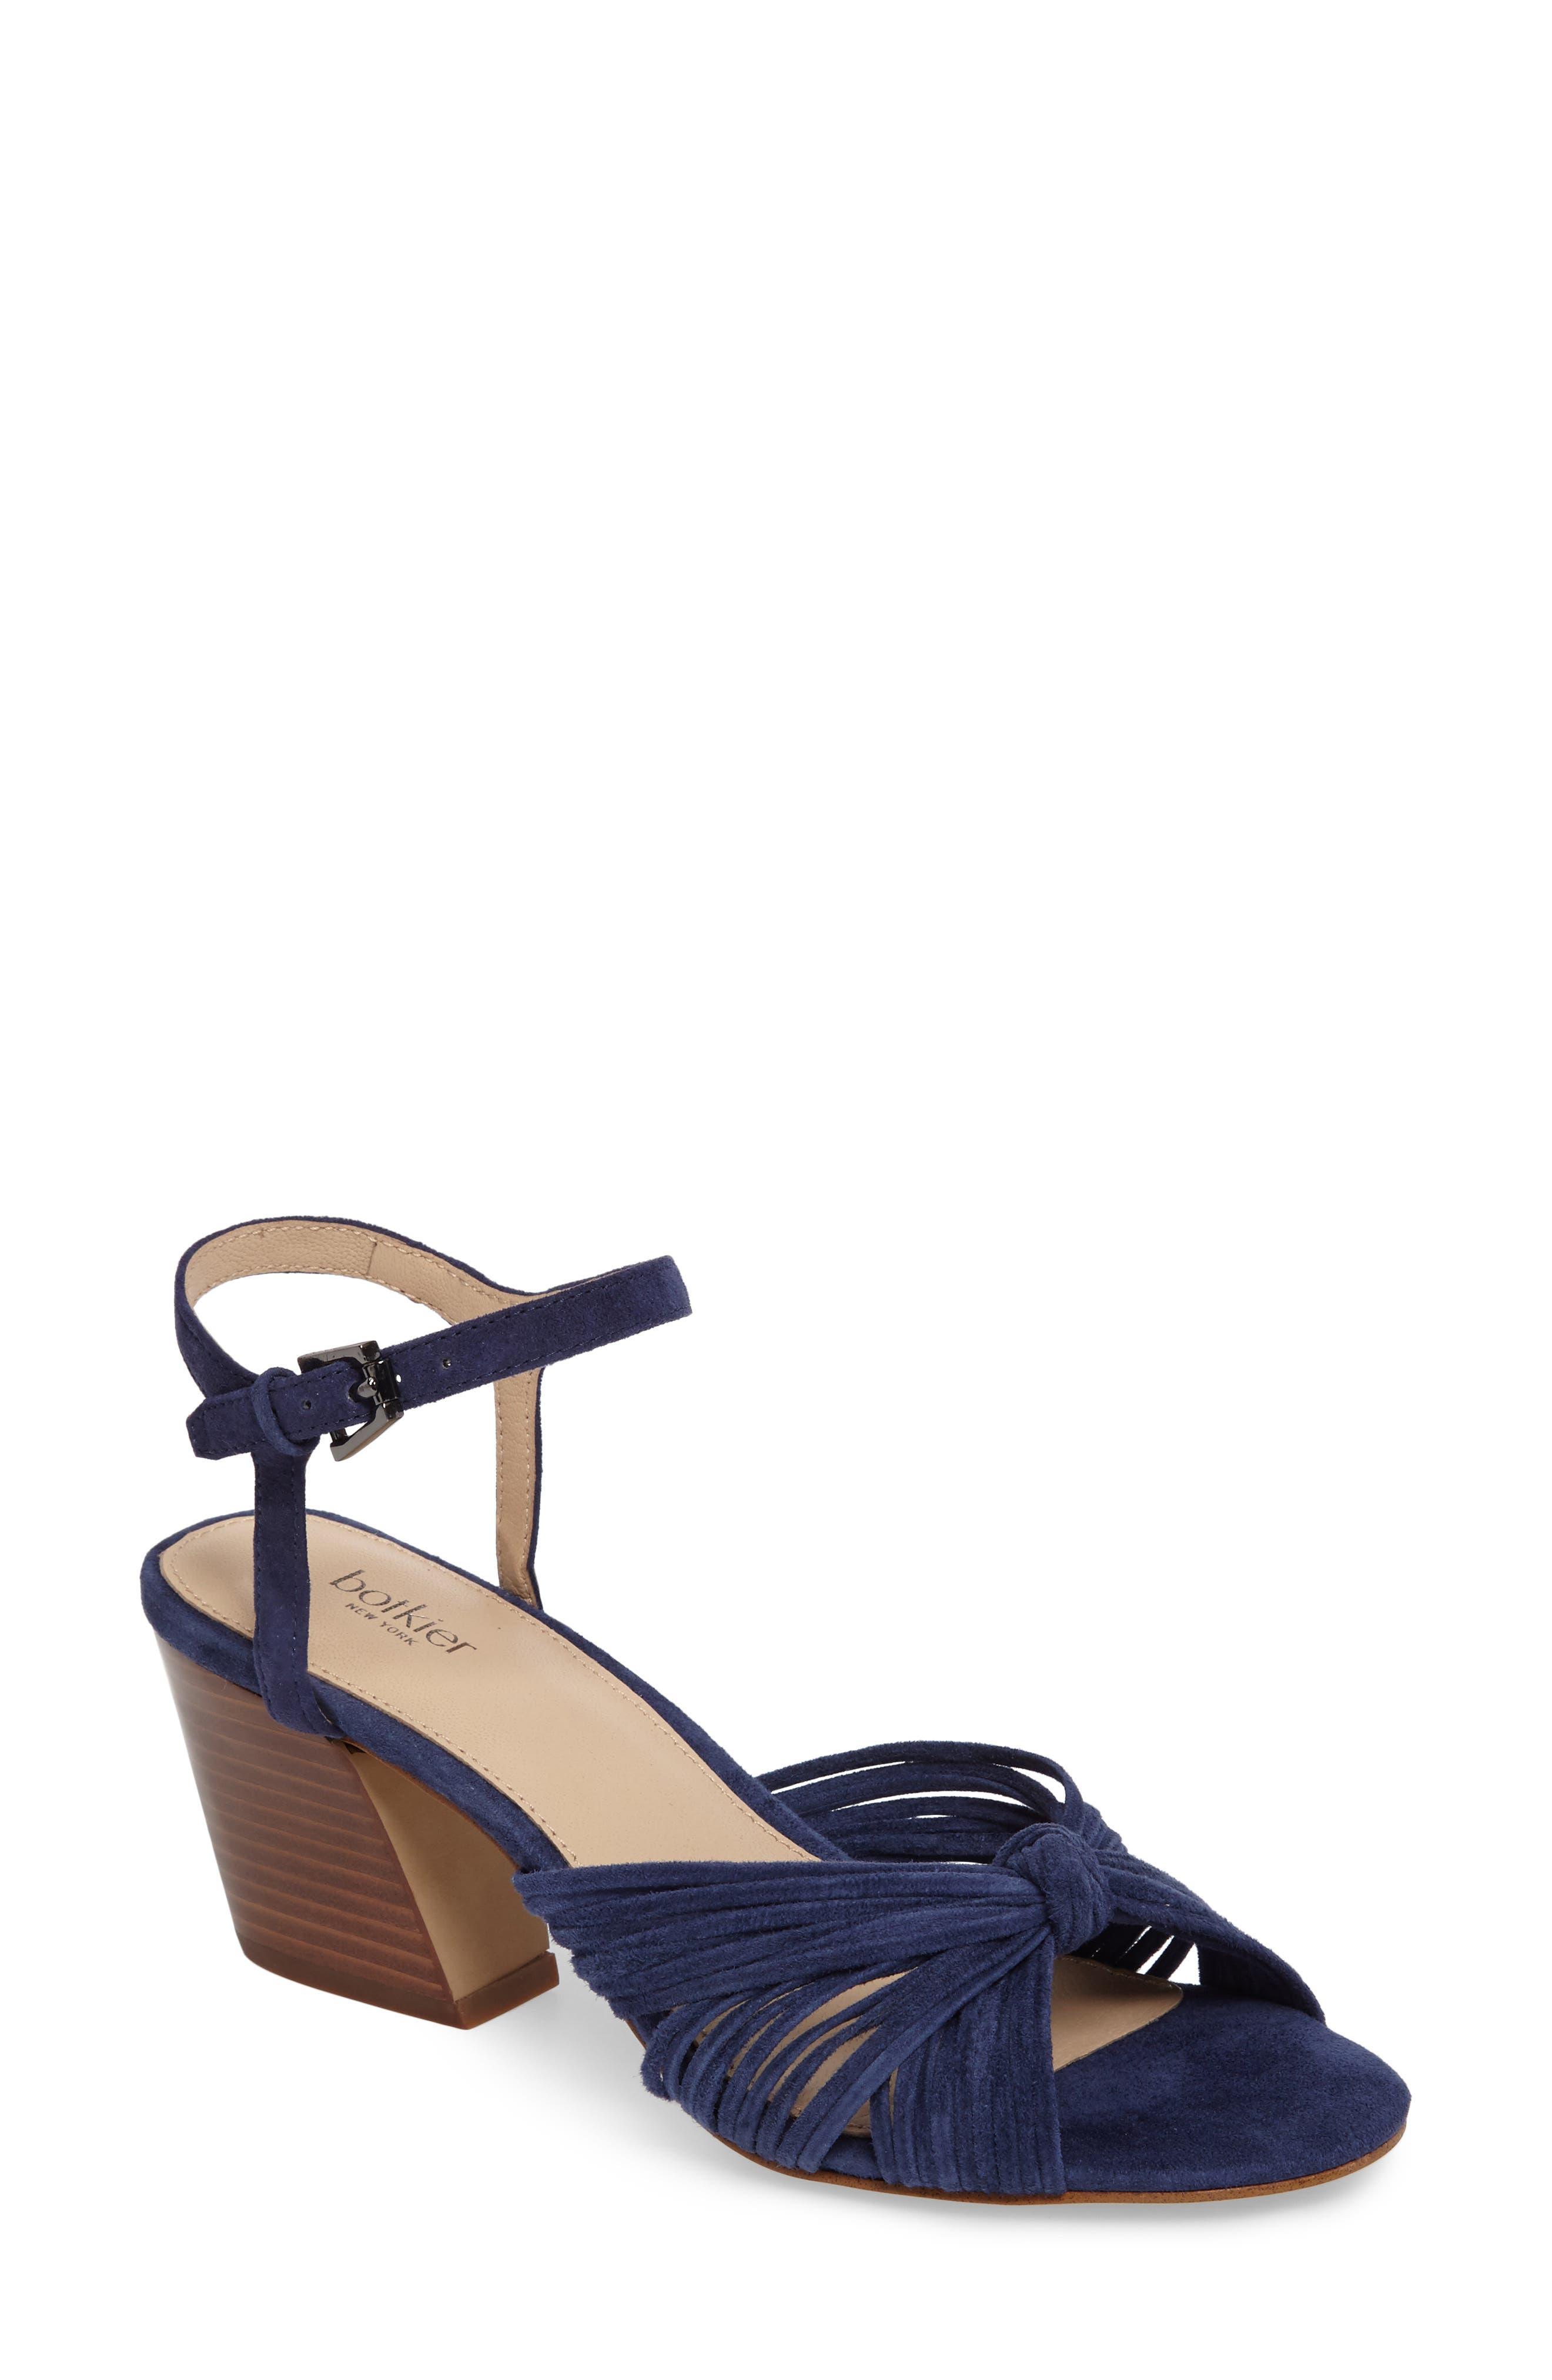 Patsy Block Heel Sandal,                         Main,                         color, Navy